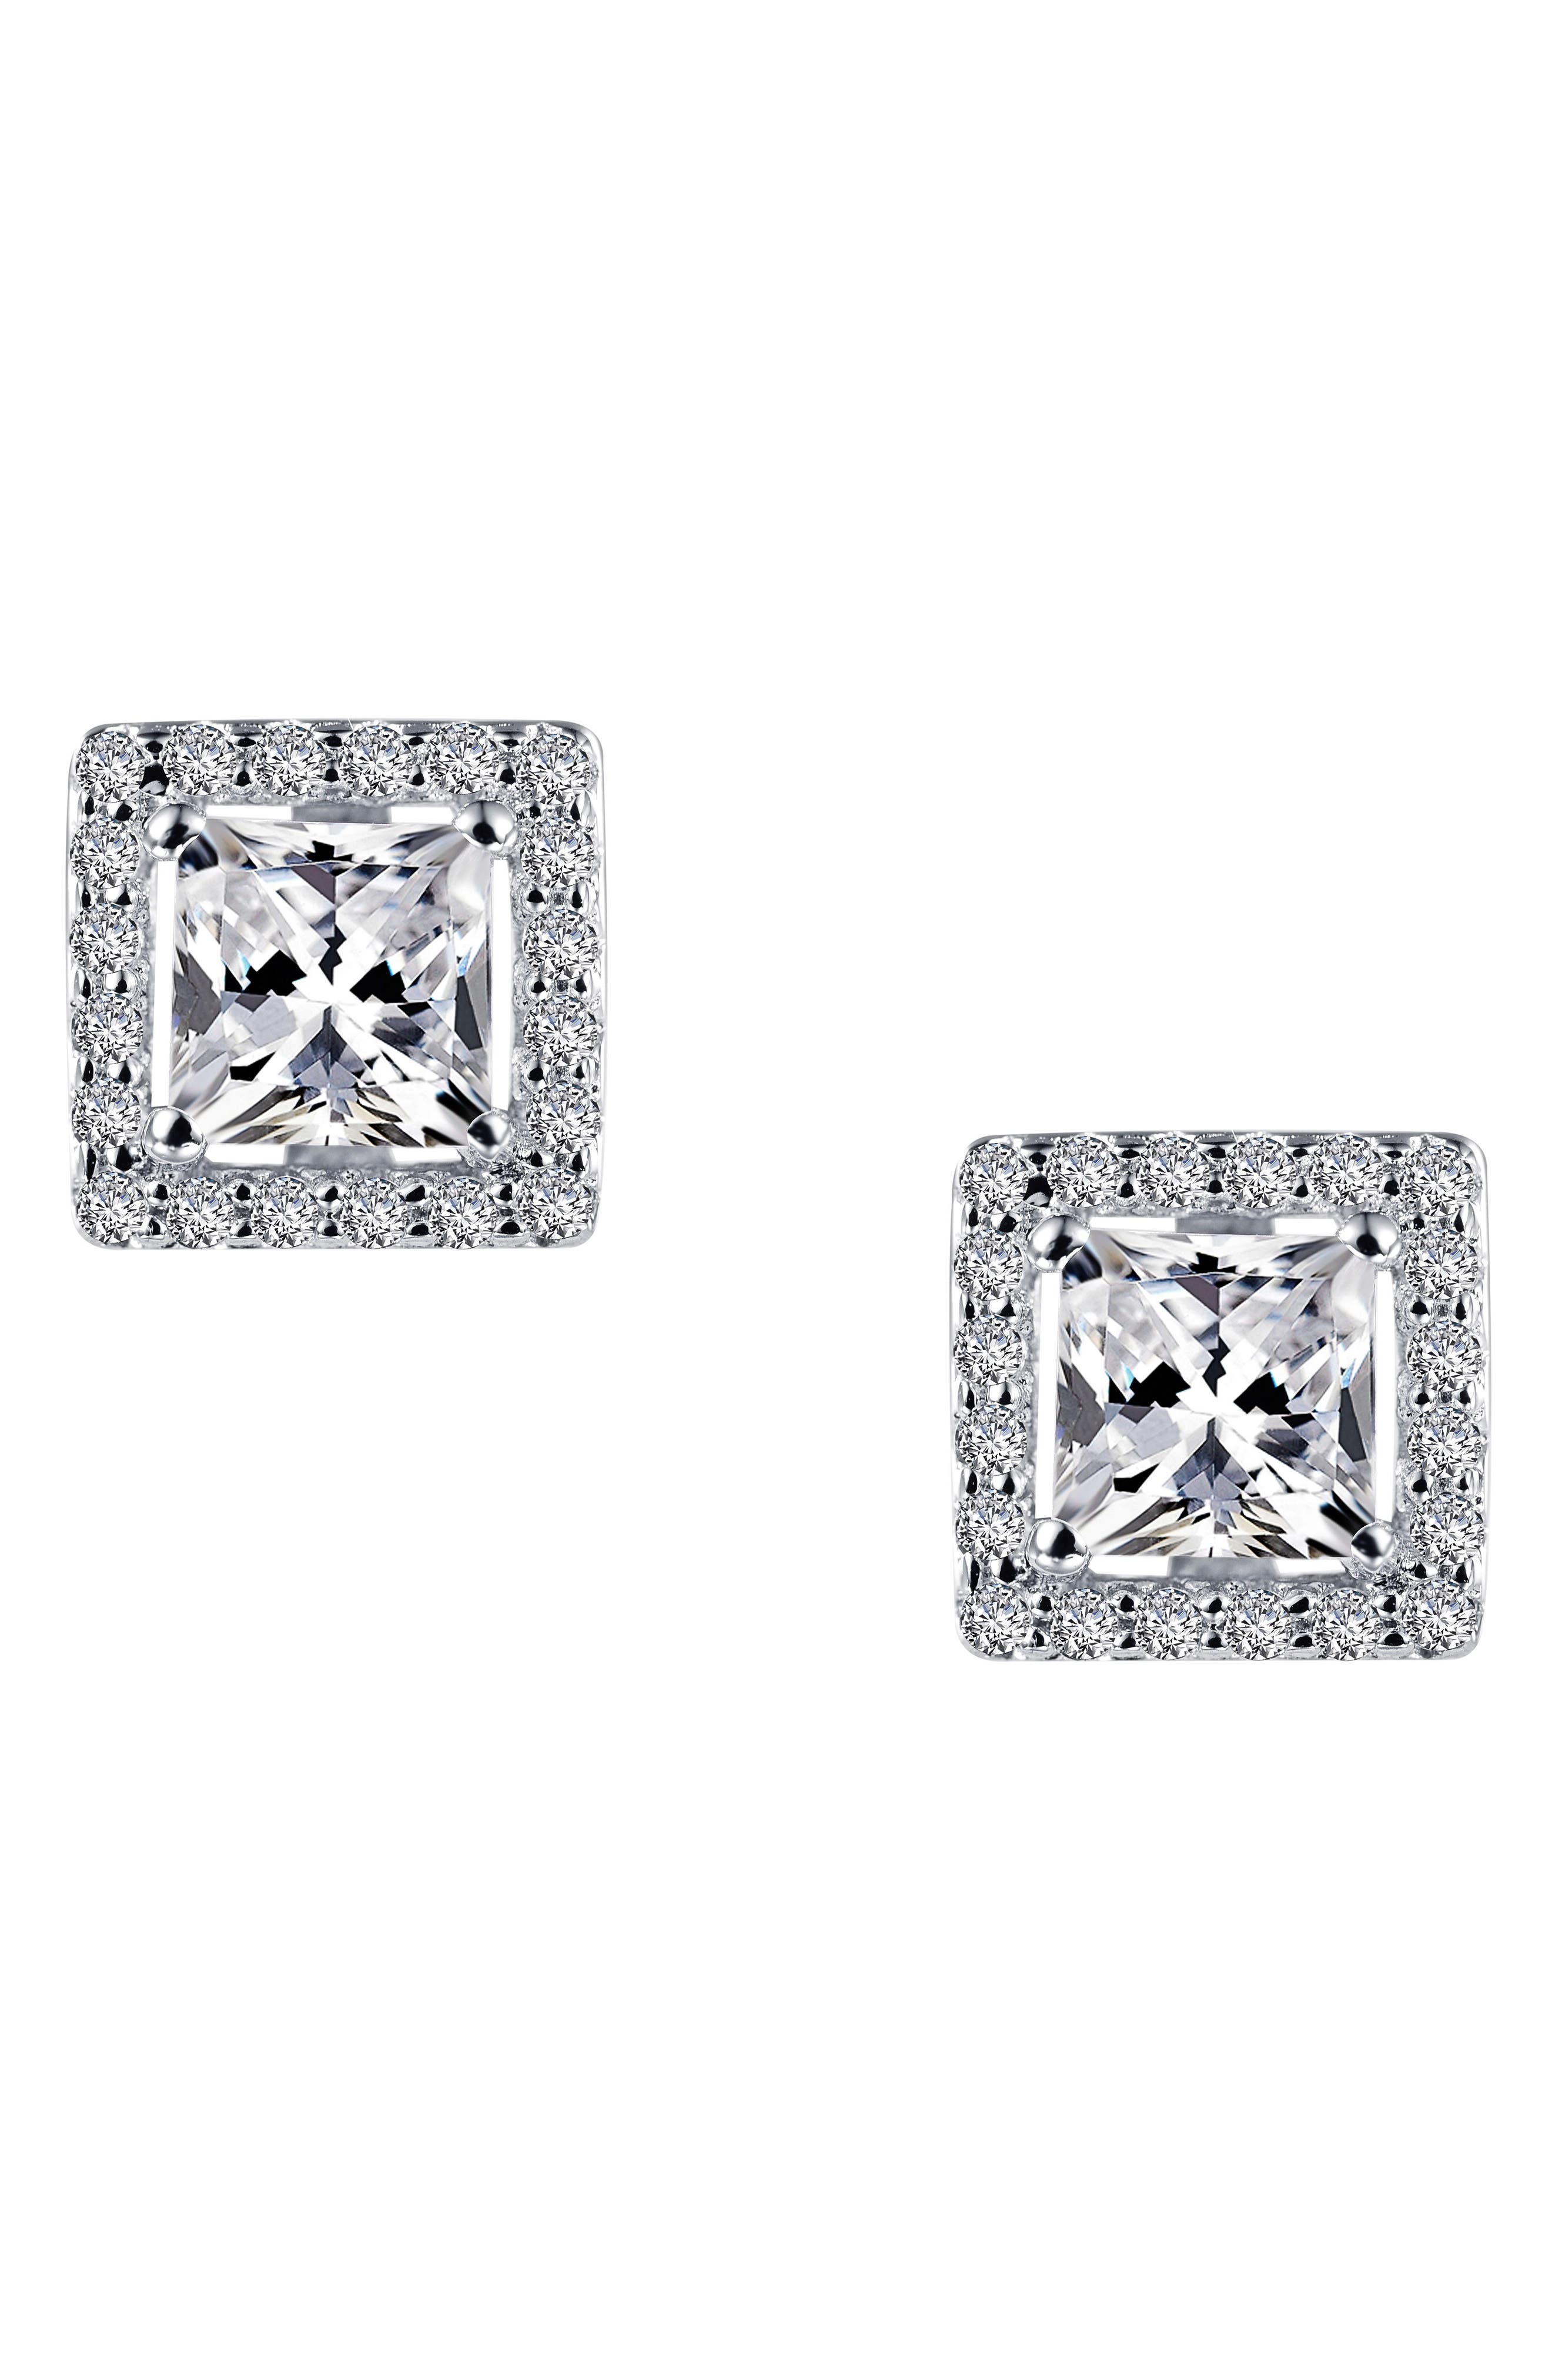 Princess Cut Simulated Diamond Stud Earrings,                             Alternate thumbnail 3, color,                             SILVER/ CLEAR